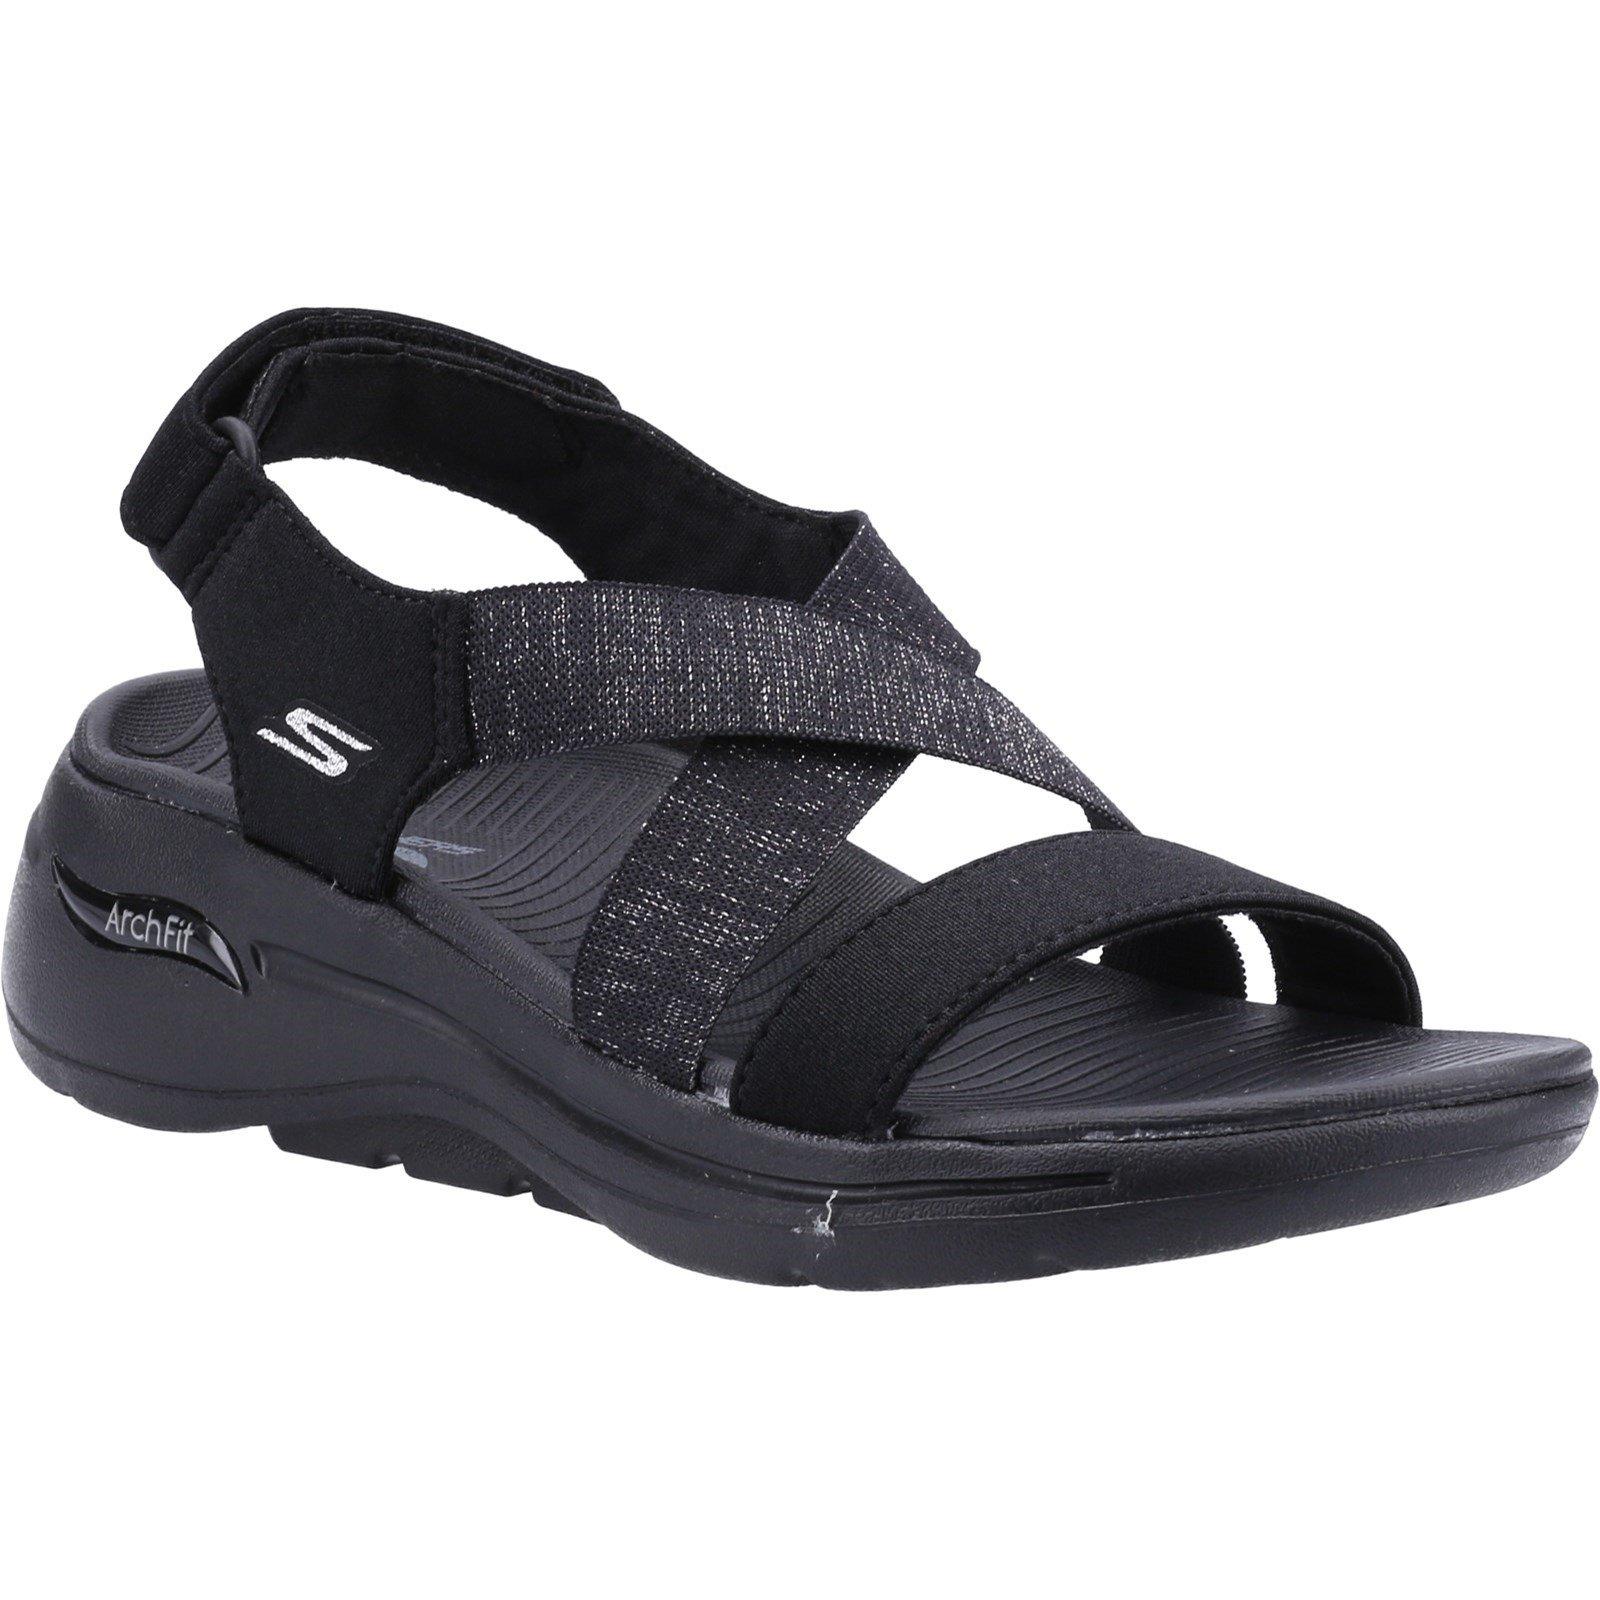 Skechers Women's Go Walk Arch Fit Astonish Summer Sandal Various Colours 32153 - Black 5